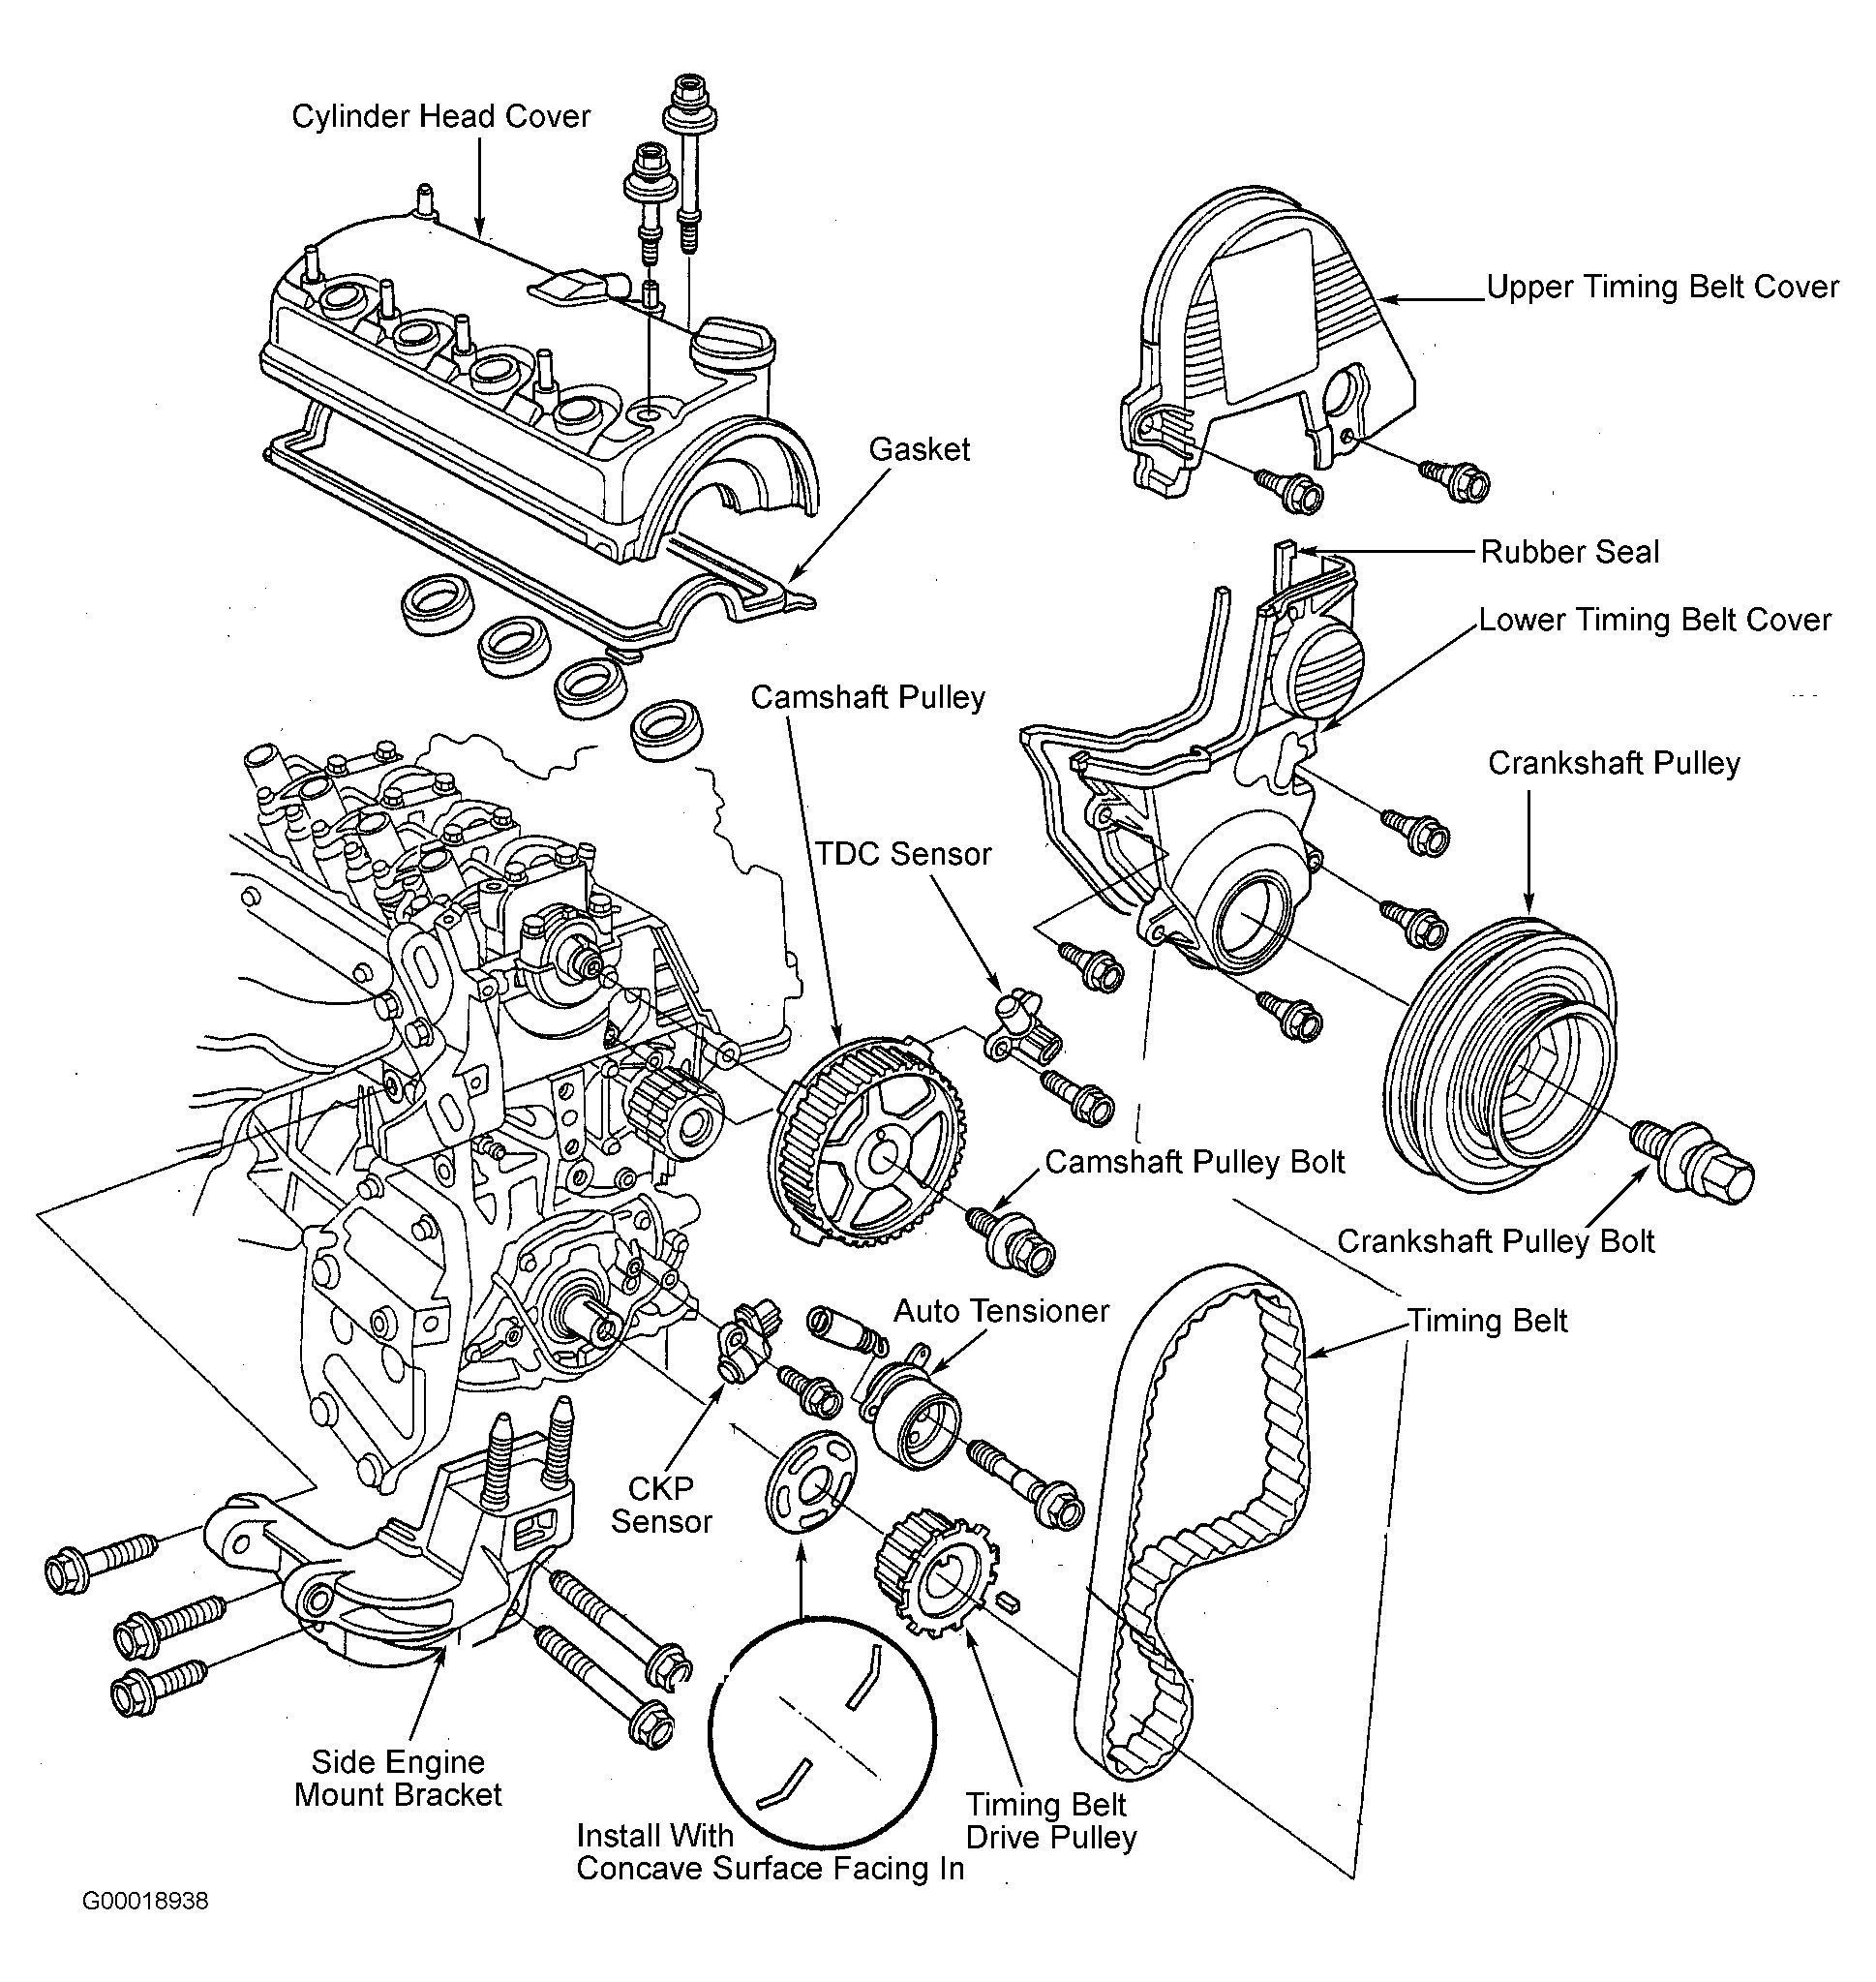 Honda Crv Engine Diagram Unlimited Wiring Diagram 2004 Honda Cr V Engine Diagram 2003 Honda Crv Engine Diagram 3 Best Cheap In 2020 Honda Civic Engine Honda Honda Crv